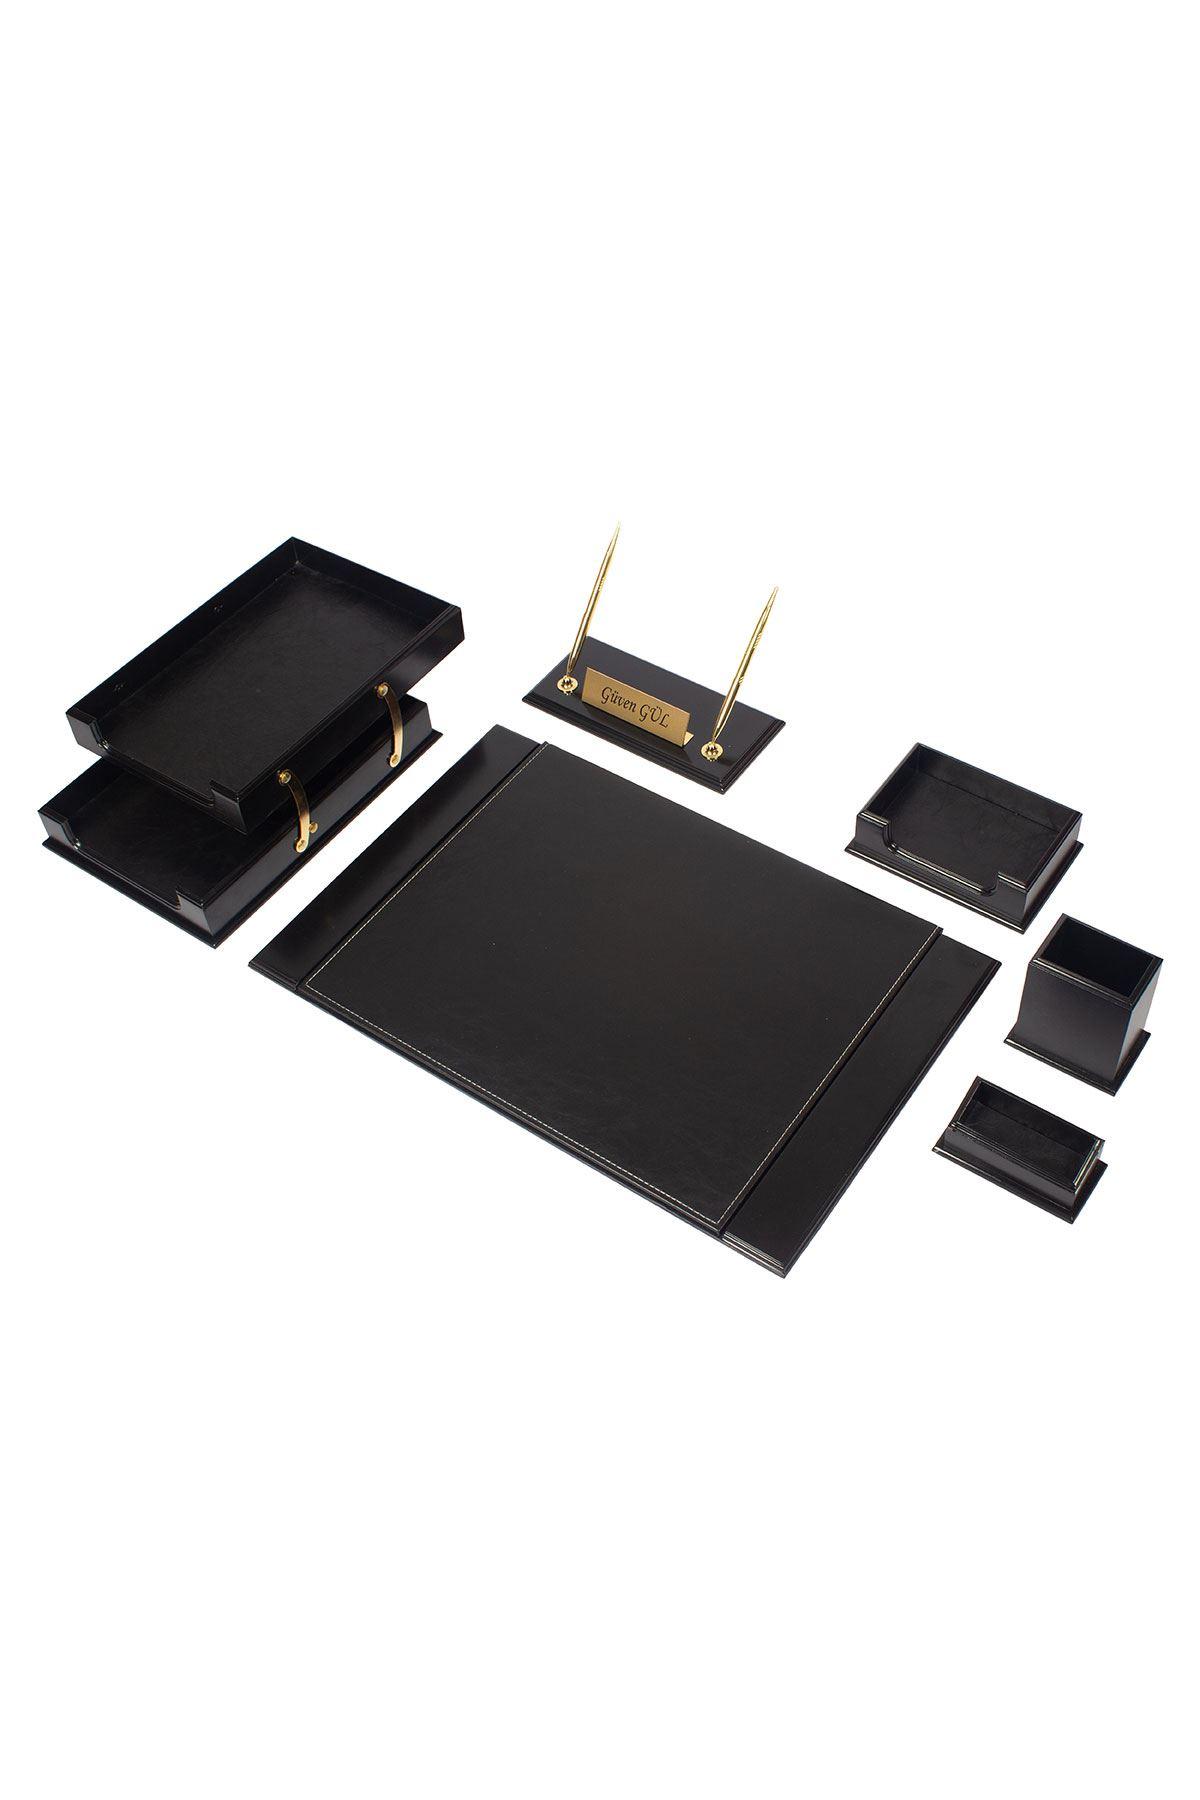 Wooden Prestige Desk Set Black 8 Accessories